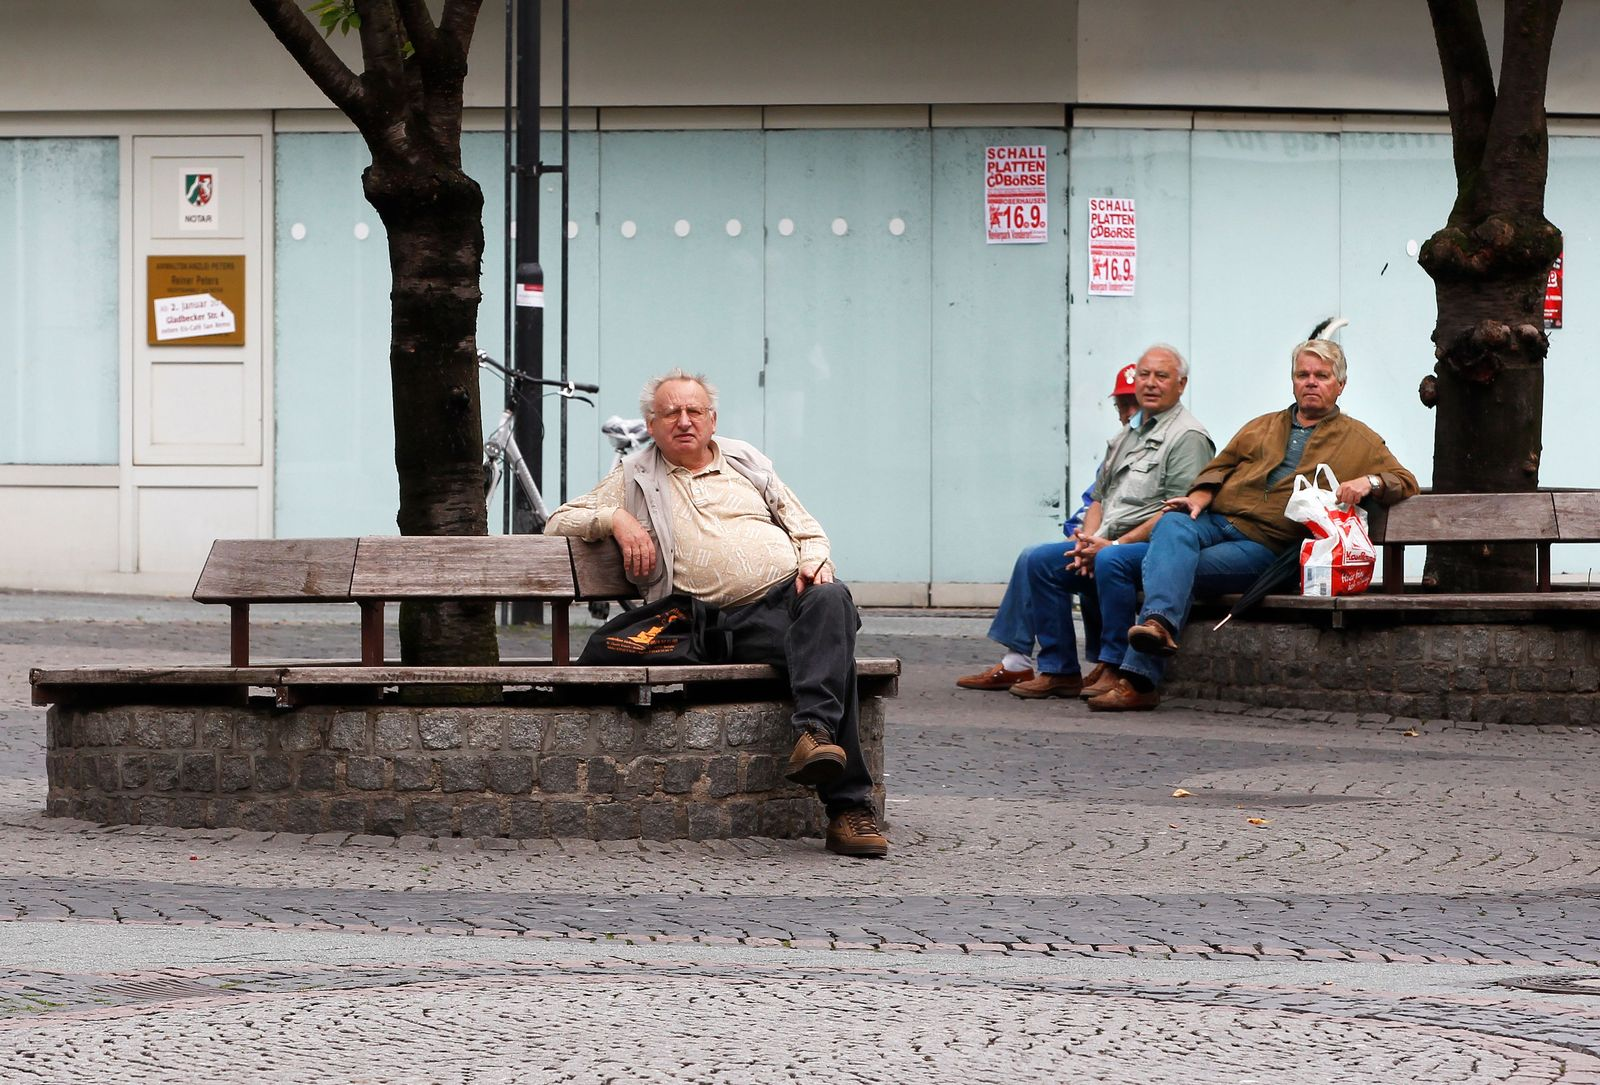 Altersarmut / Armut / Arm / Bedürftige / Rentner